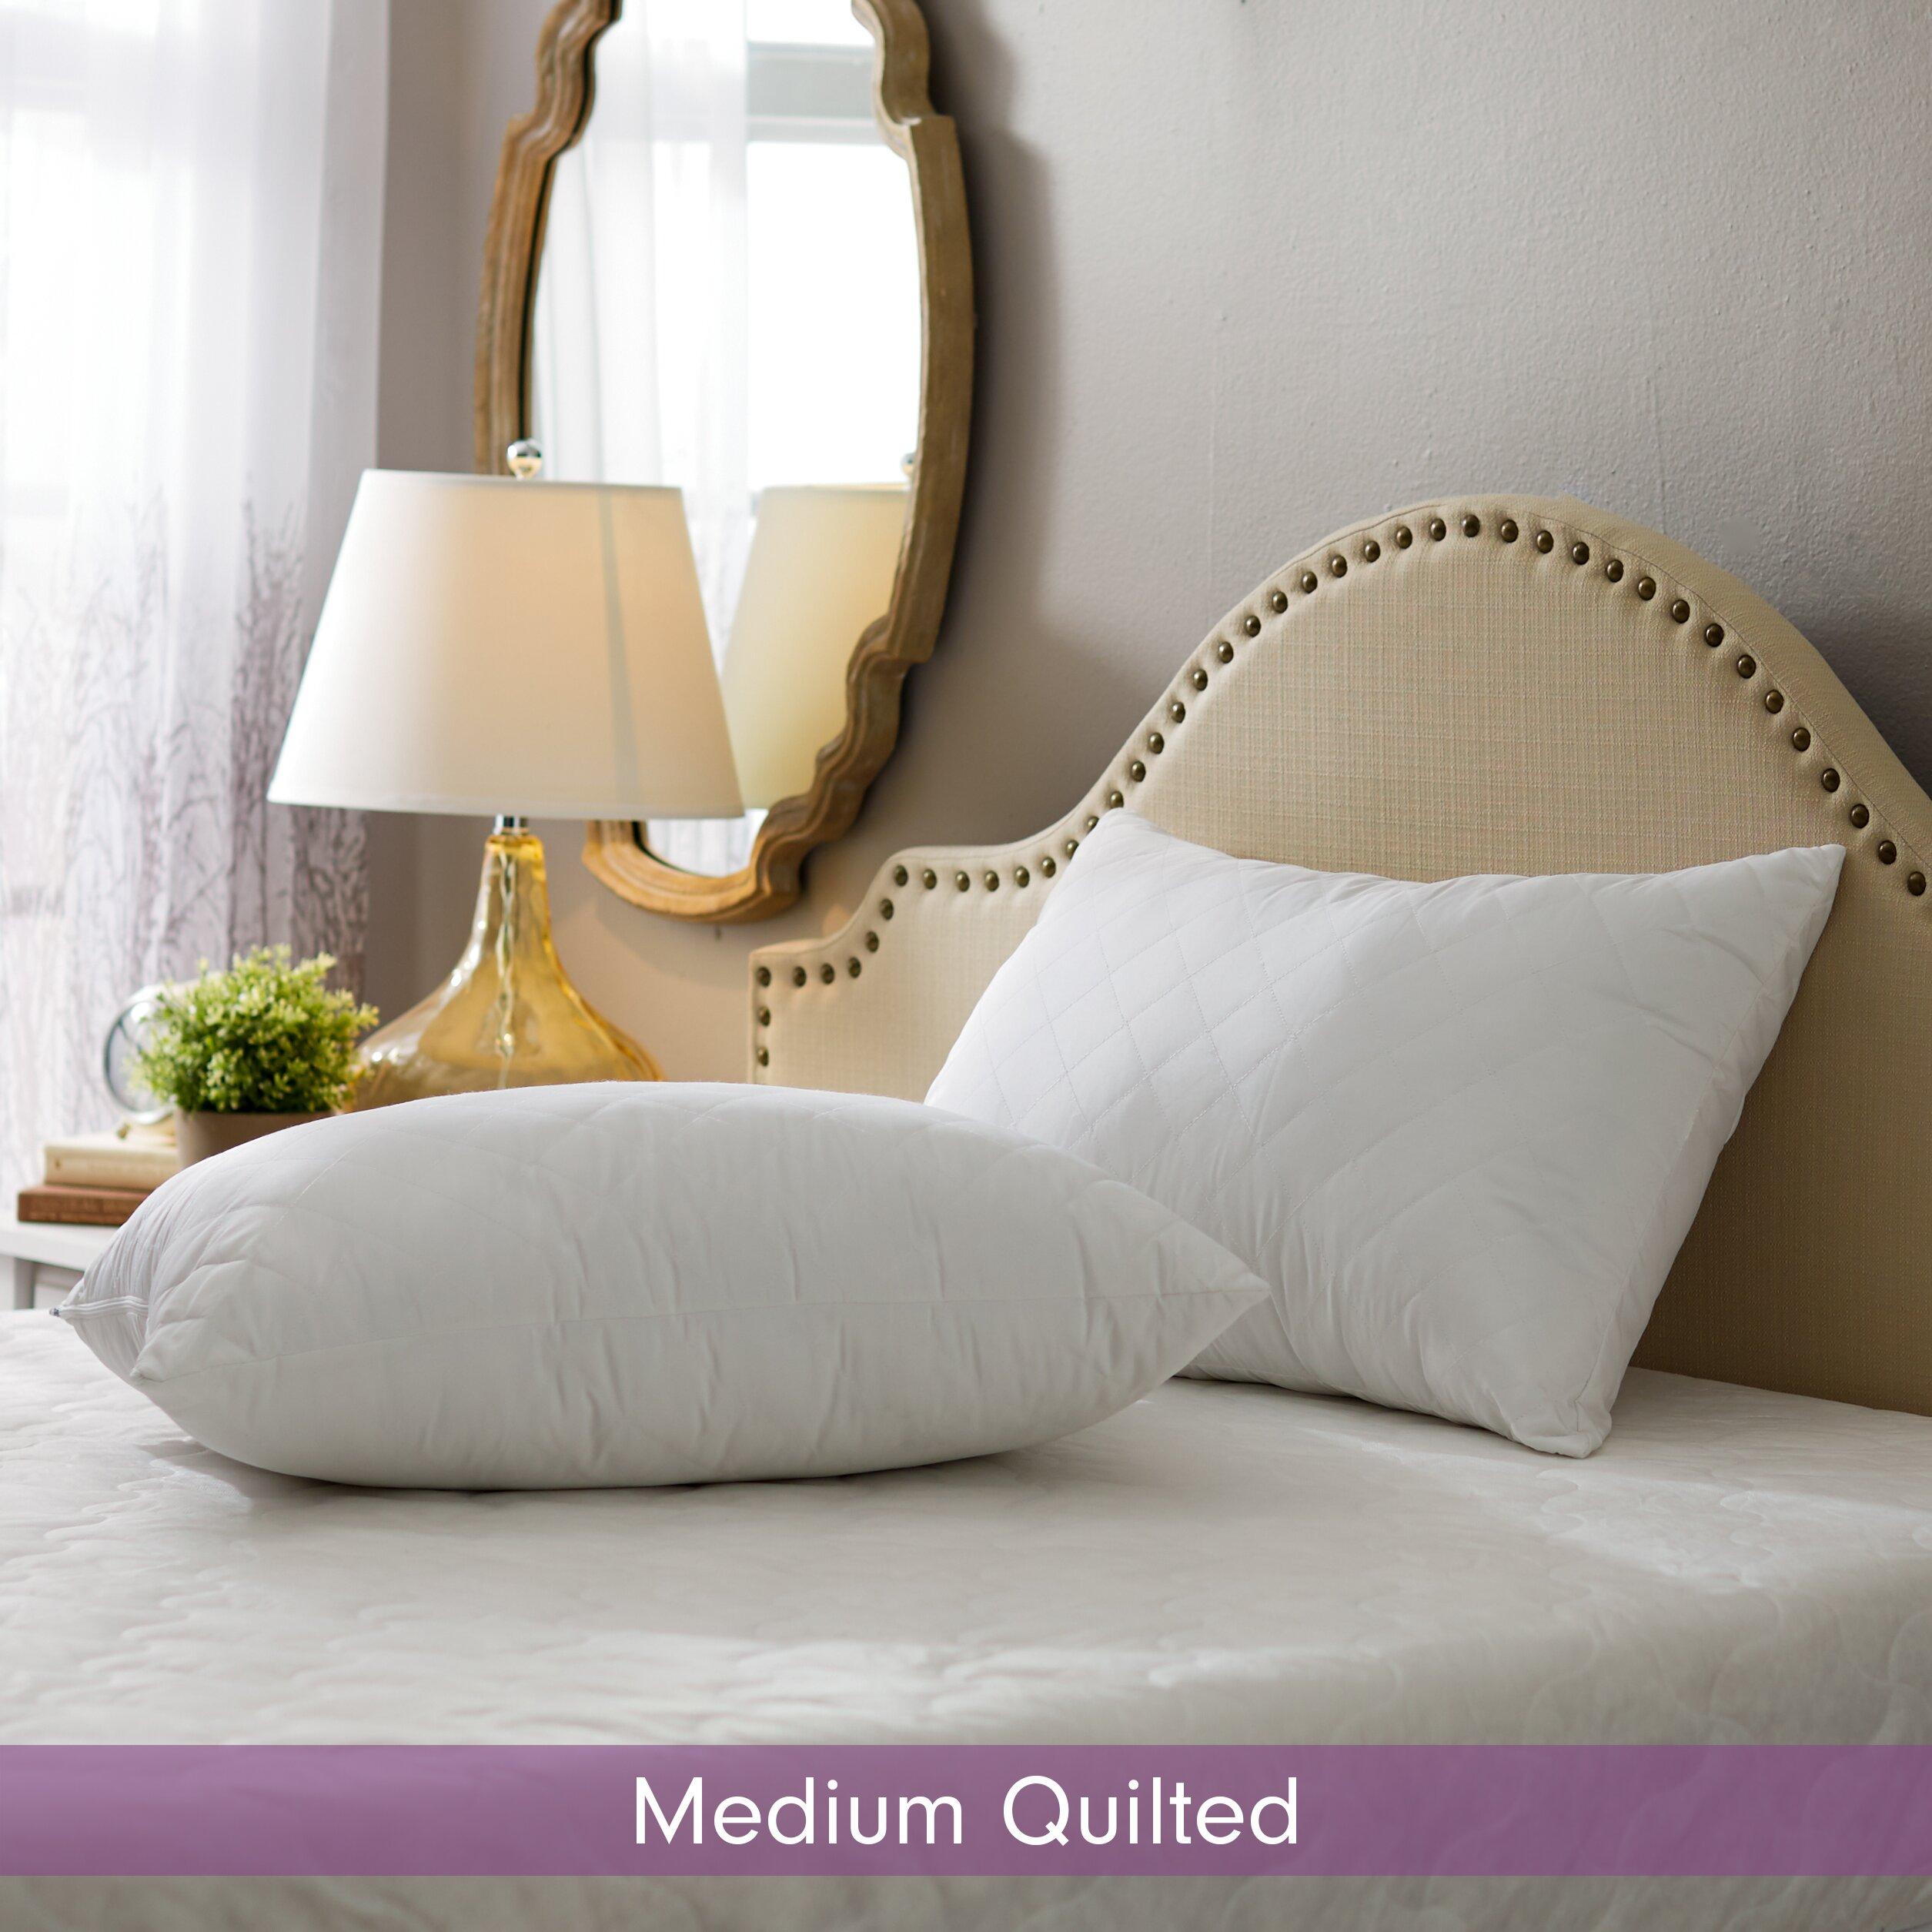 Wayfair sleep wayfair sleep medium quilted pillow for Bed pillows reviews